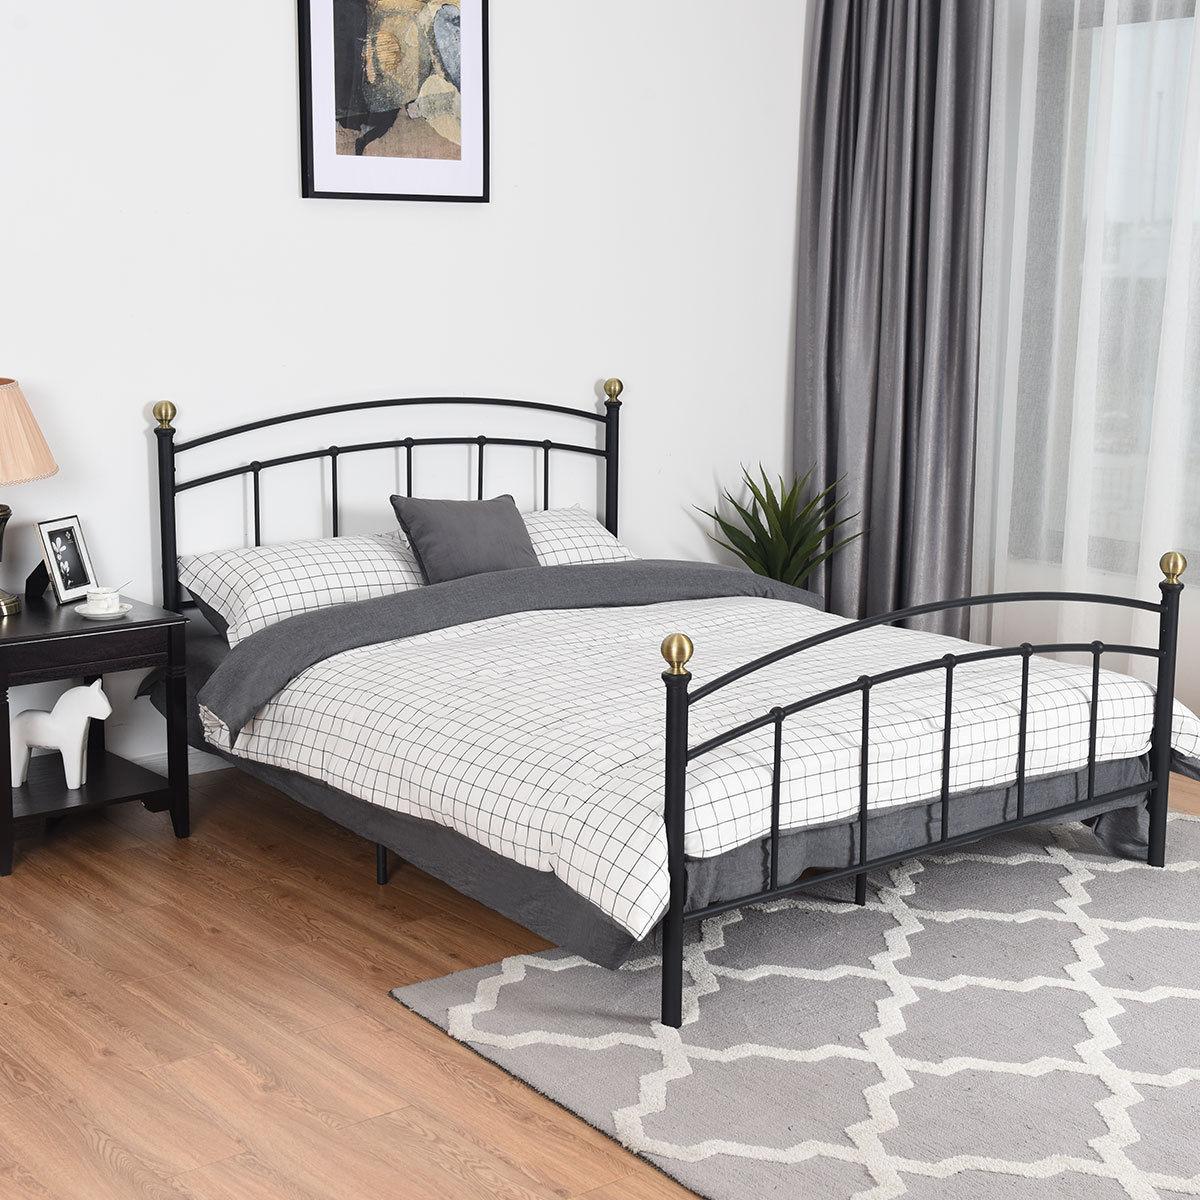 Gymax Queen Size Metal Bed Frame Platform Metal Slat Support Headboard Footboard